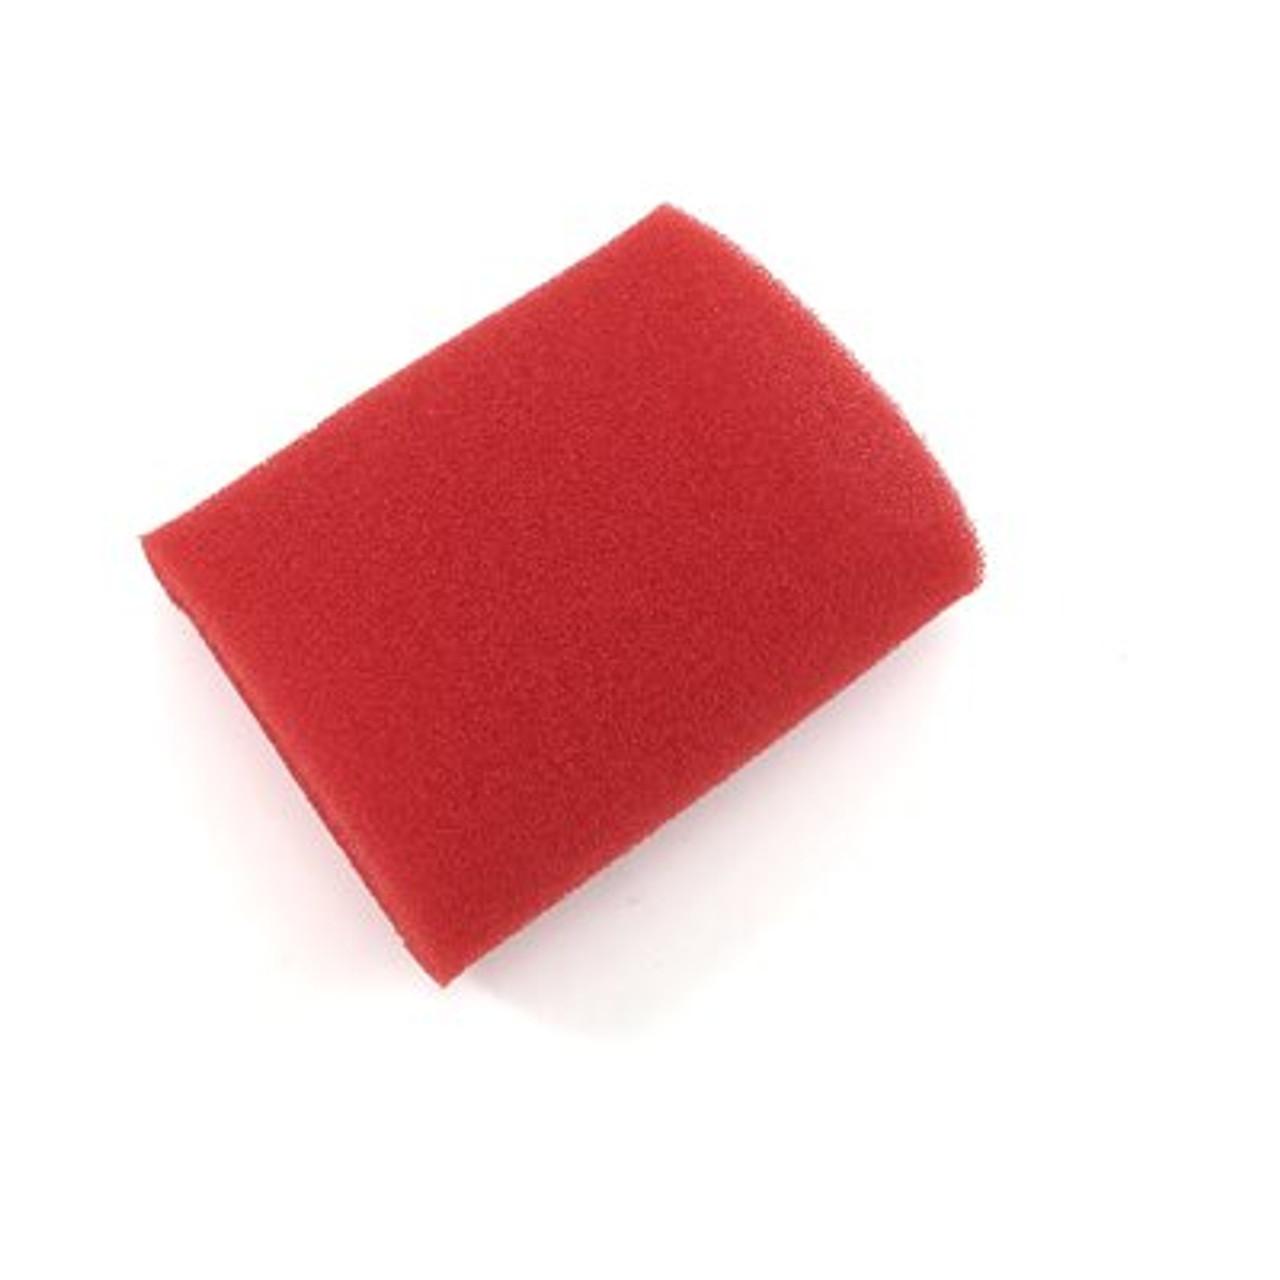 "Prefilter, Foam 3-1/2"" x 5"" Red"